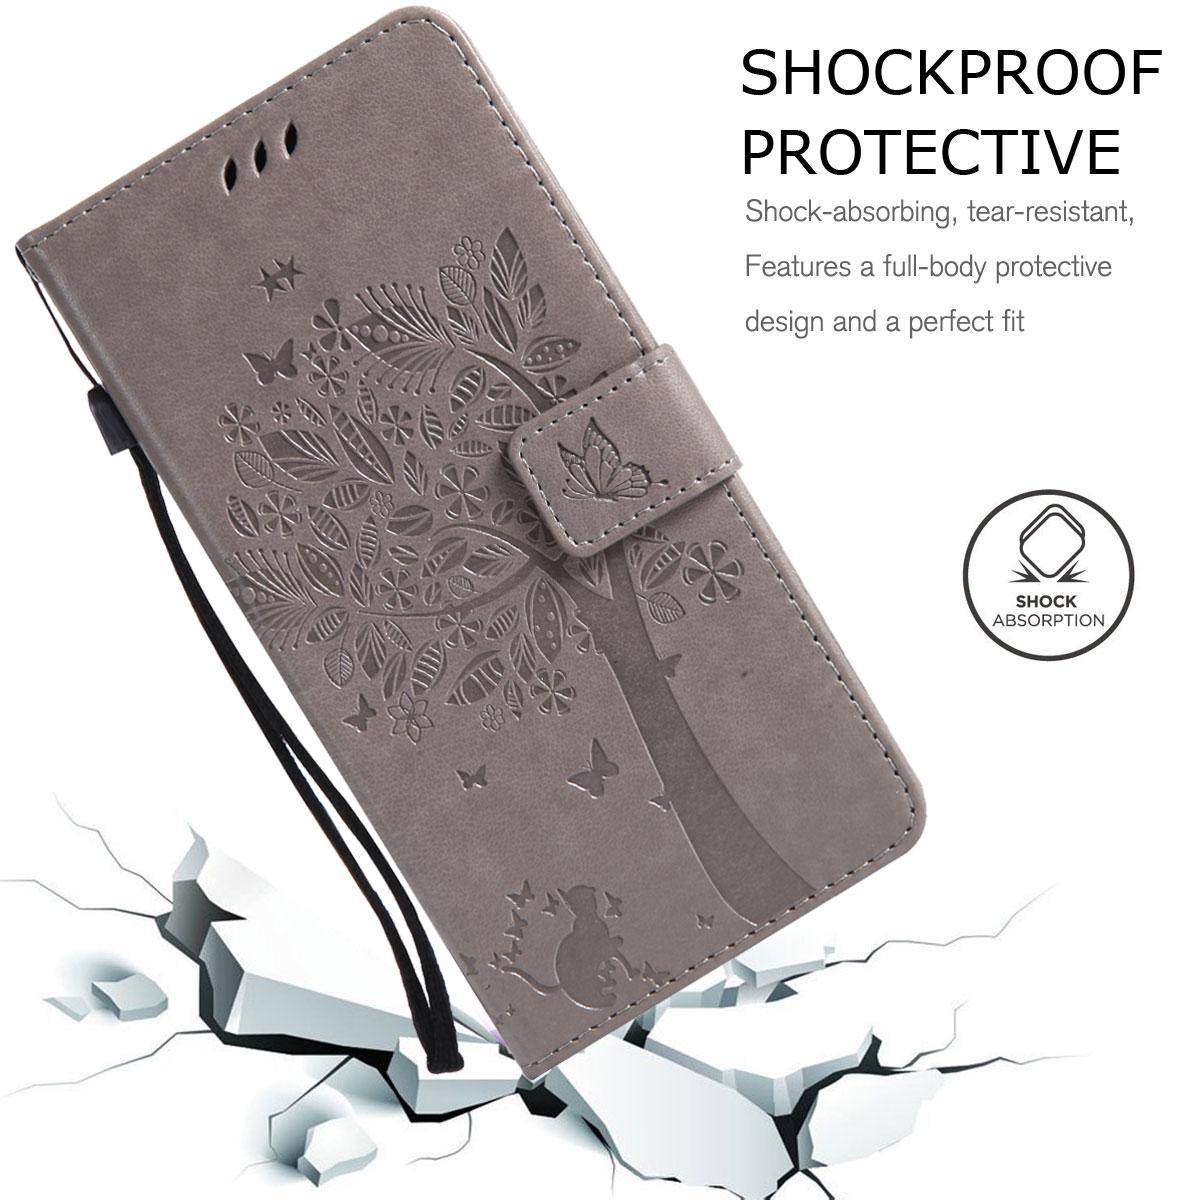 Magnetic-Leather-Credit-Card-Holder-Flip-Case-Cover-For-Google-Pixel-2-2-XL thumbnail 39